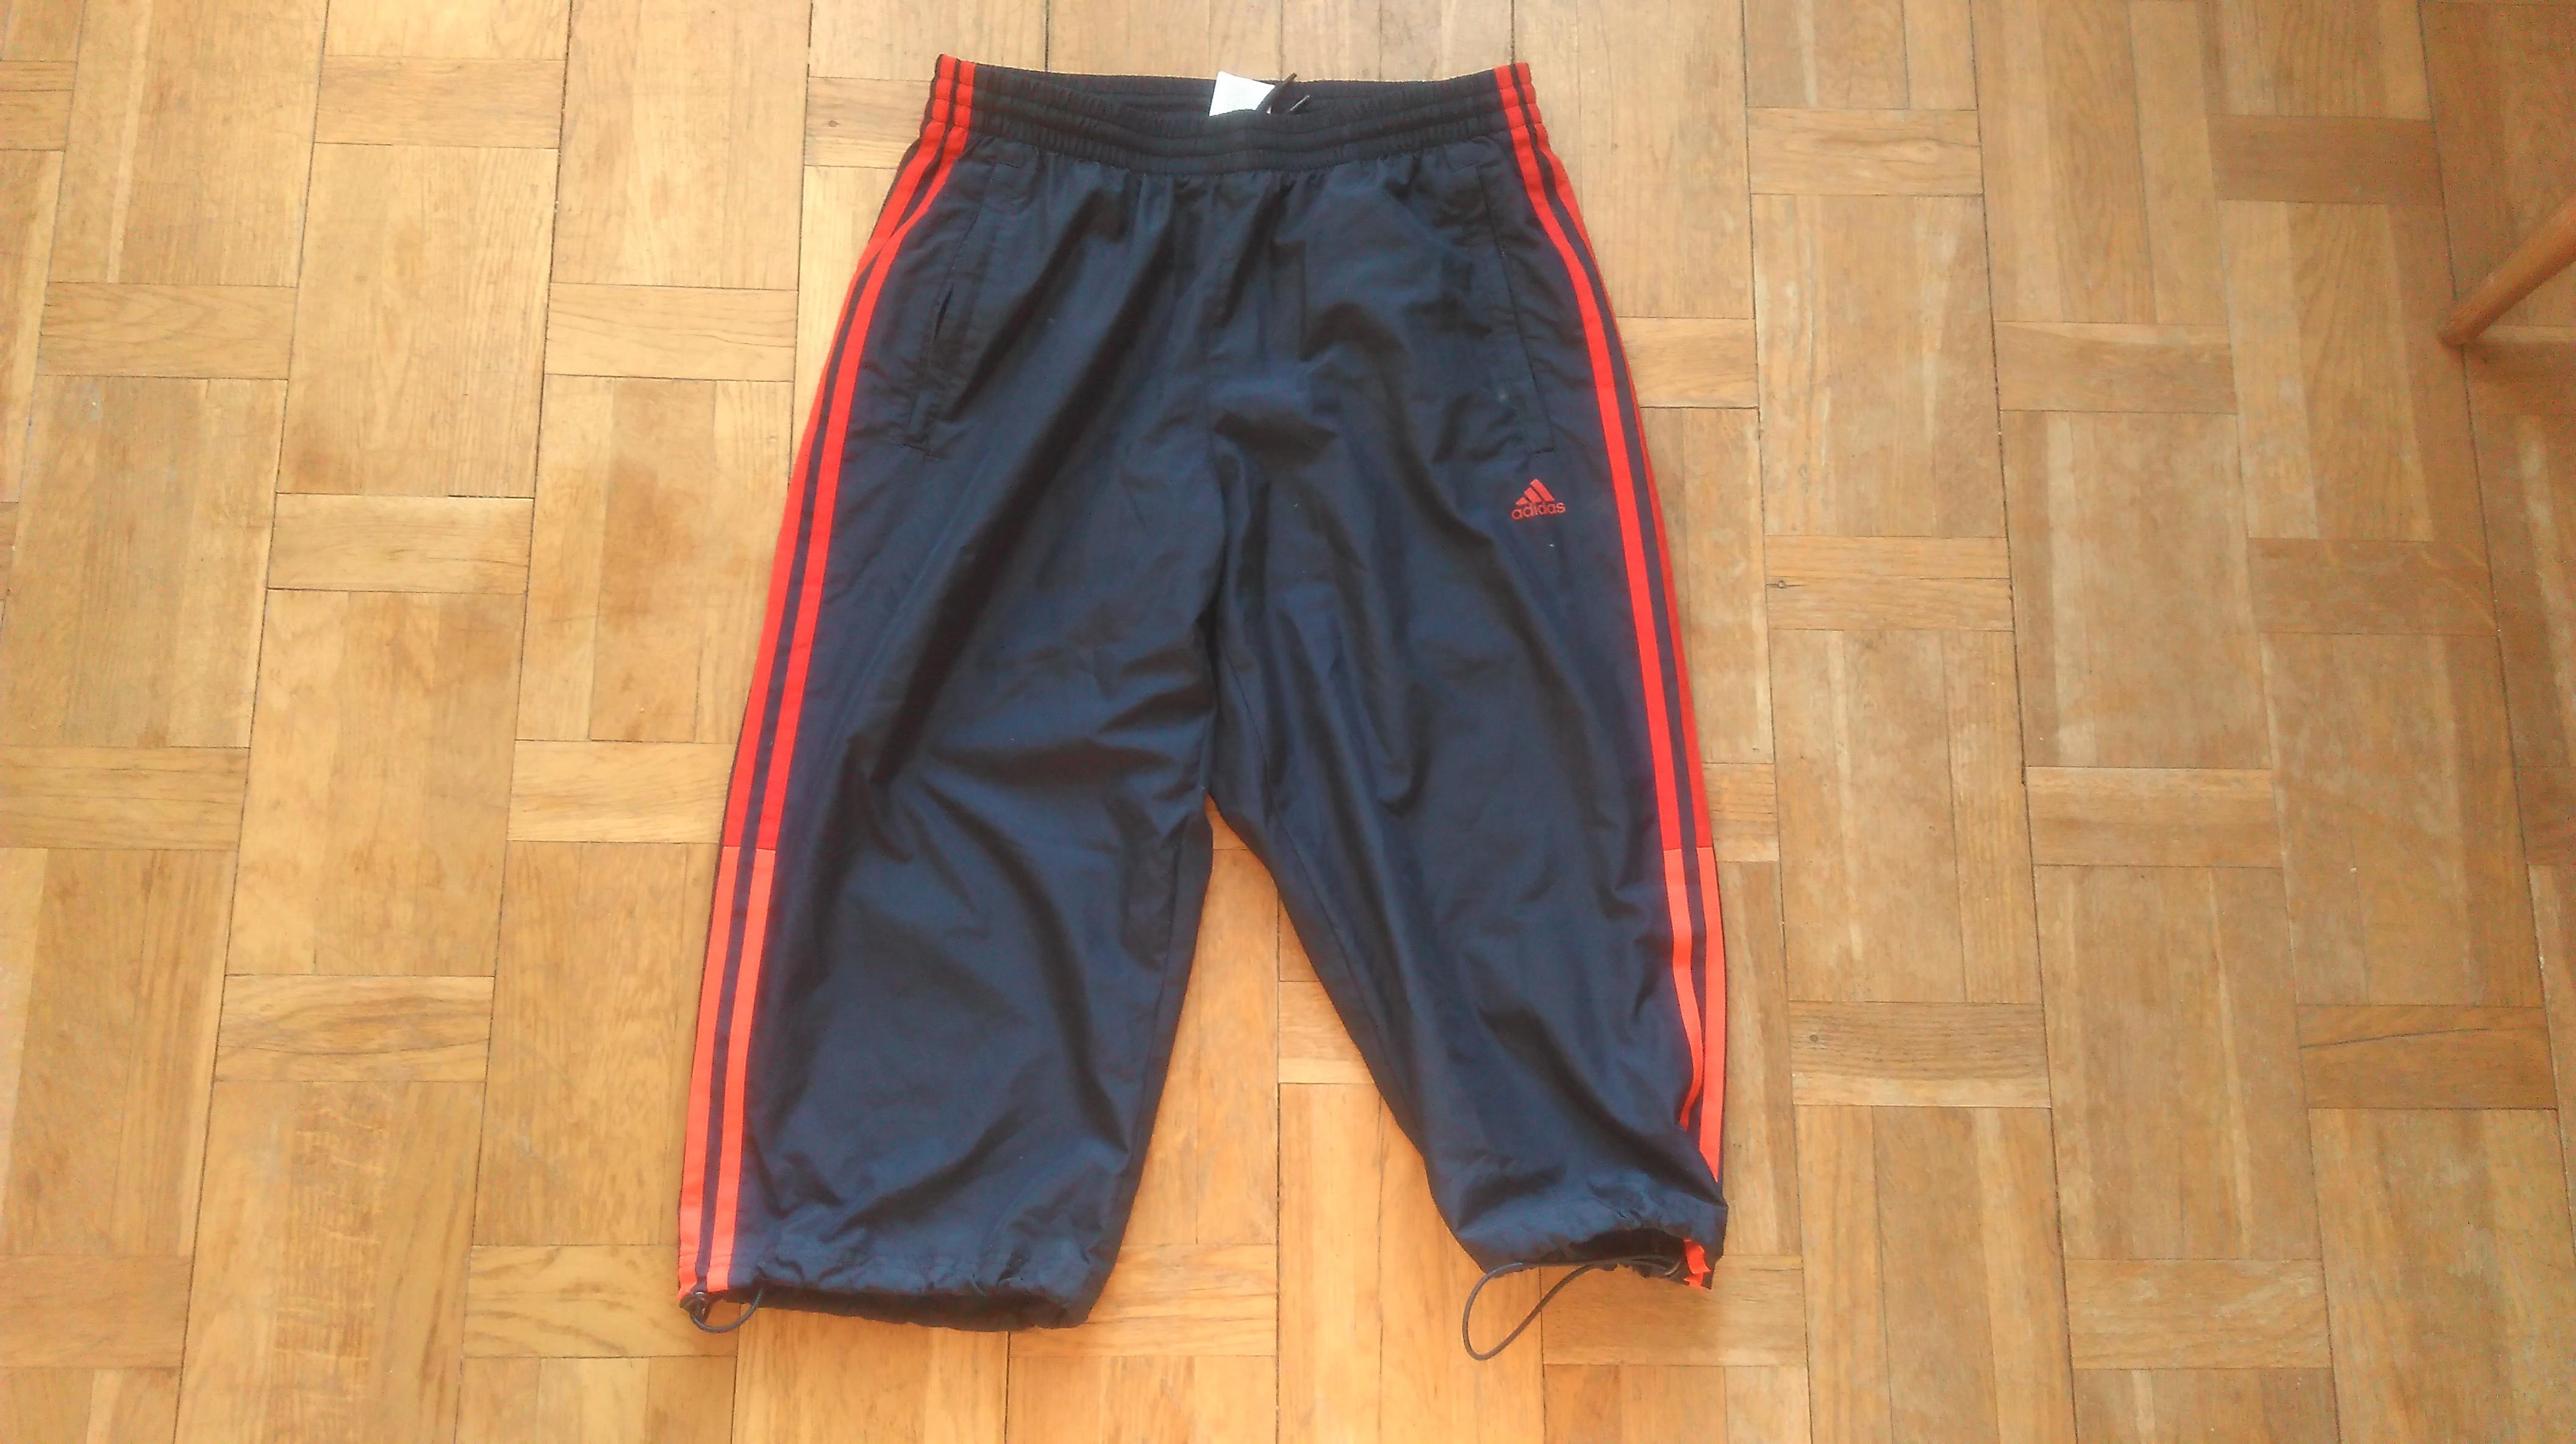 0f2114e4c8 Adidas ×. Adidas Performance Mens 3/4 Length Training Long Shorts Dark Blue  With Red And Orange Stripes Size Medium ...